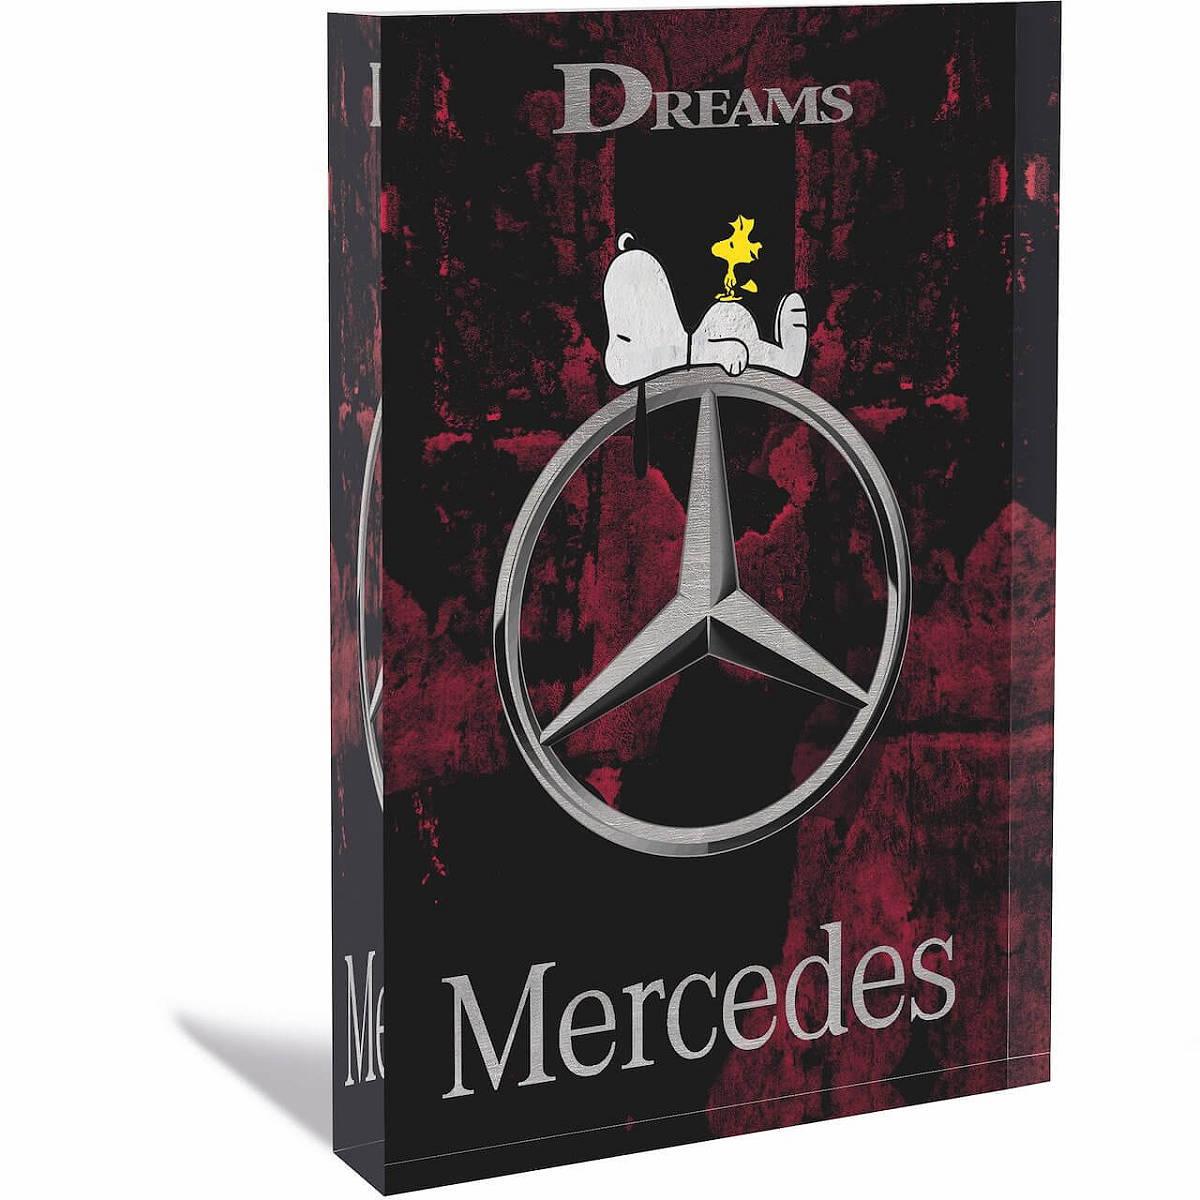 Mercedes Dreams von Devin Miles.